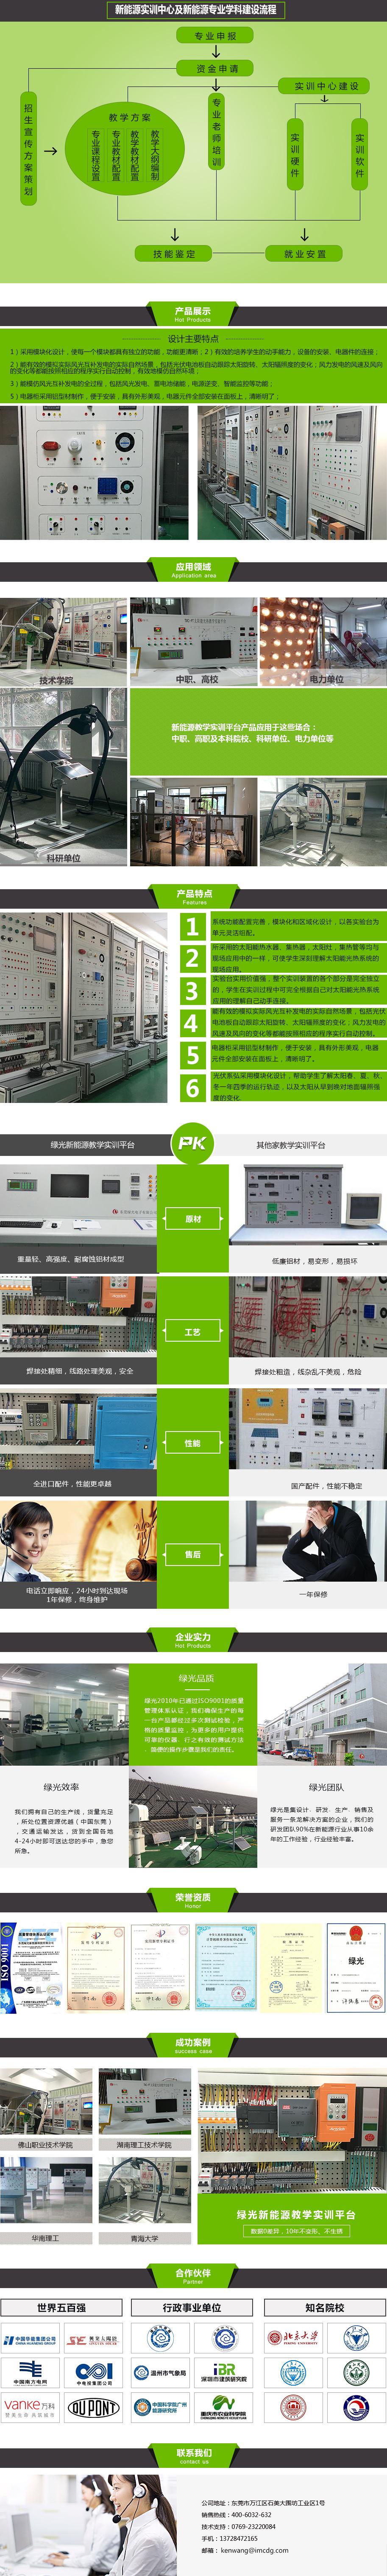 TMC-WS400.jpg